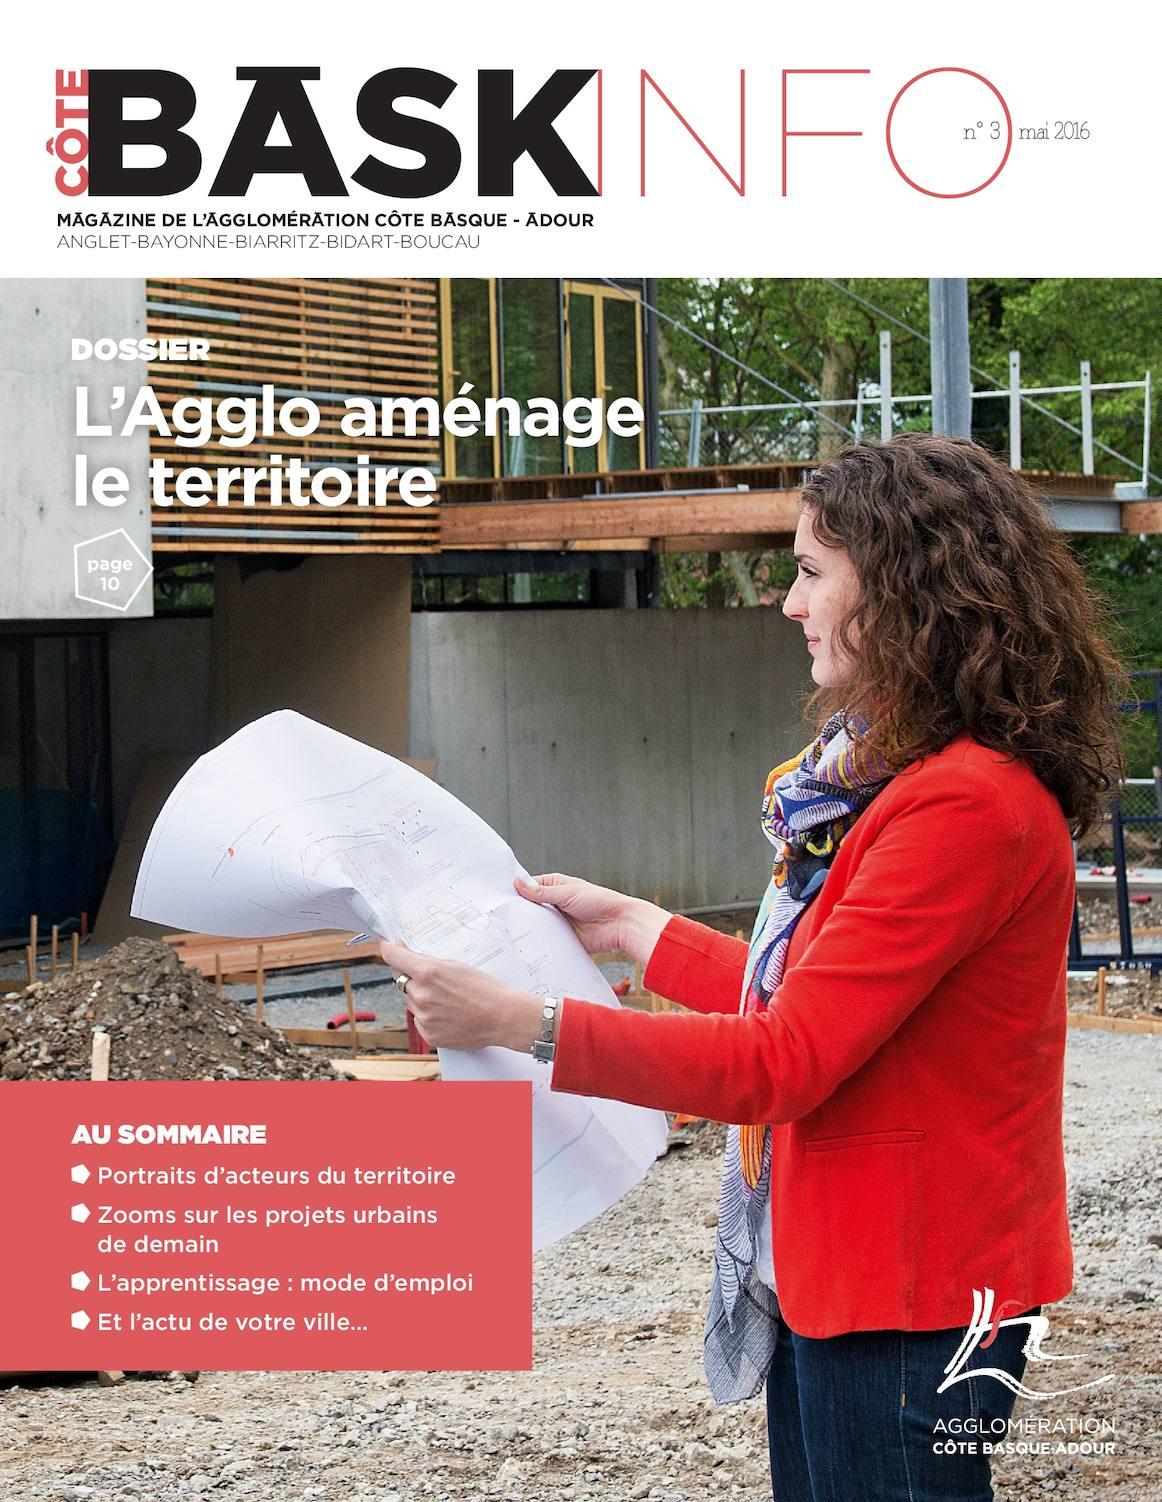 2016 N°3 Mai Côte Calaméo Bask Info mwyvON80Pn